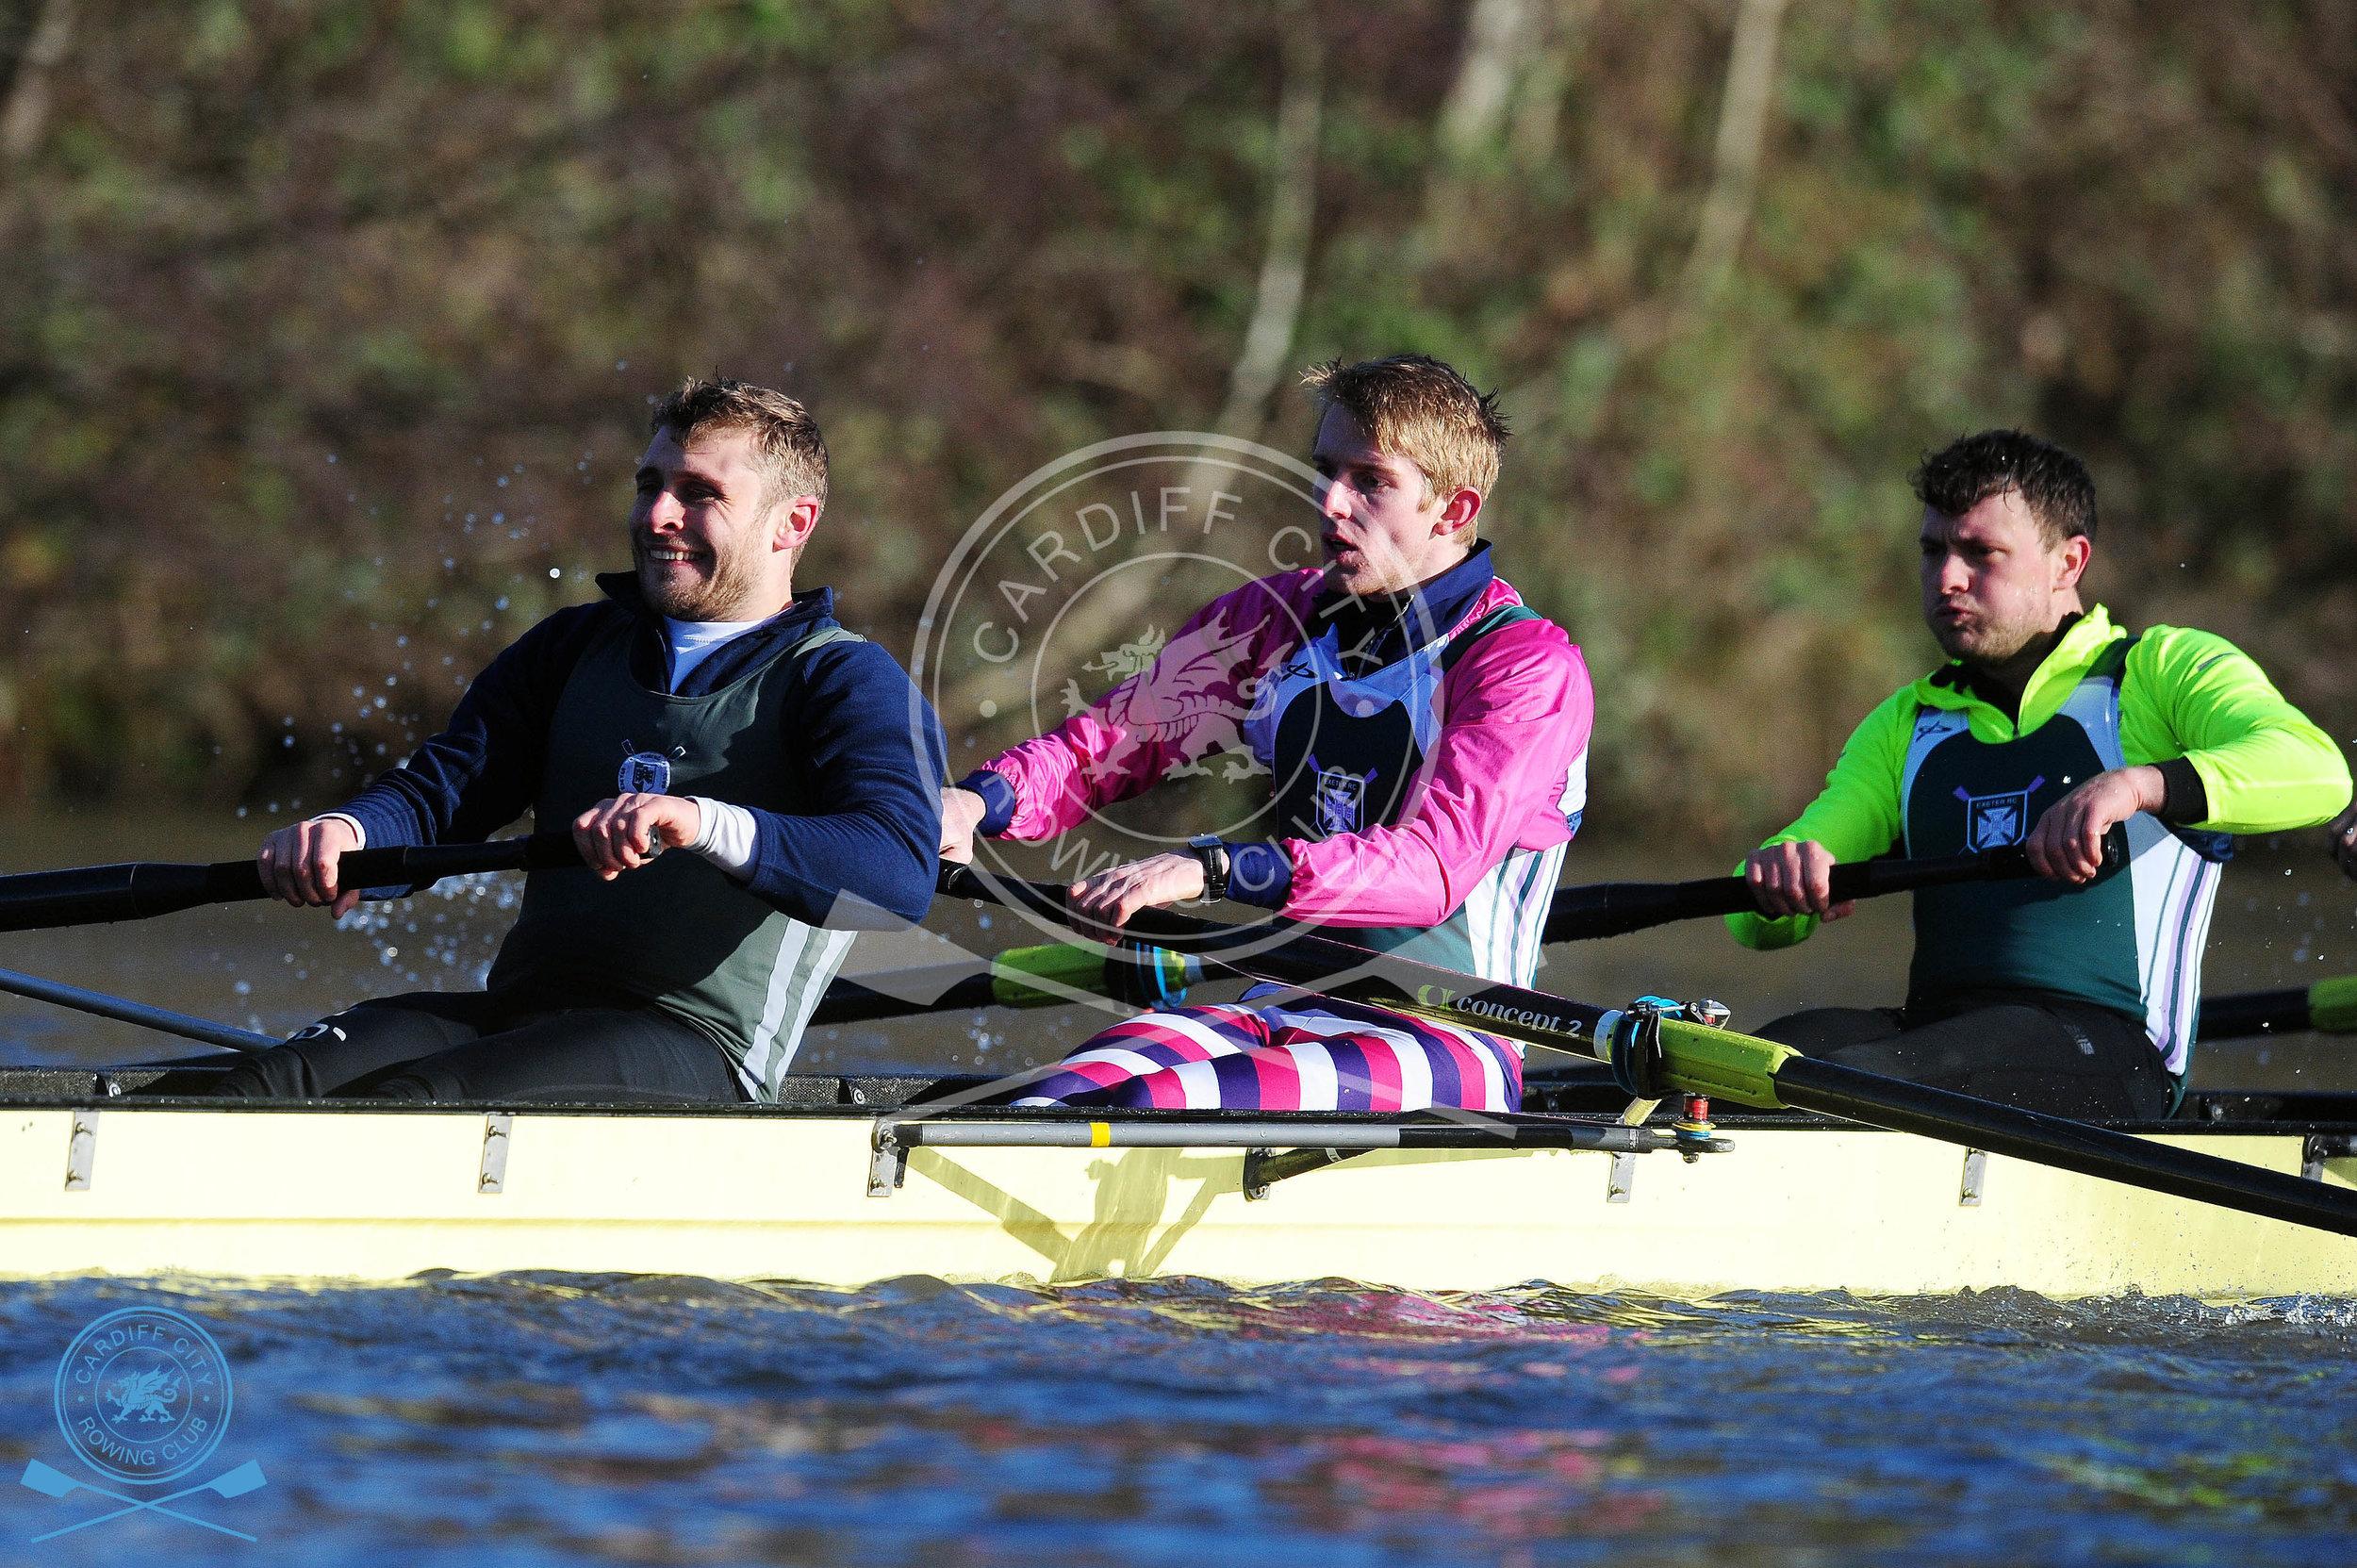 DW_280119_Cardiff_City_Rowing_222.jpg